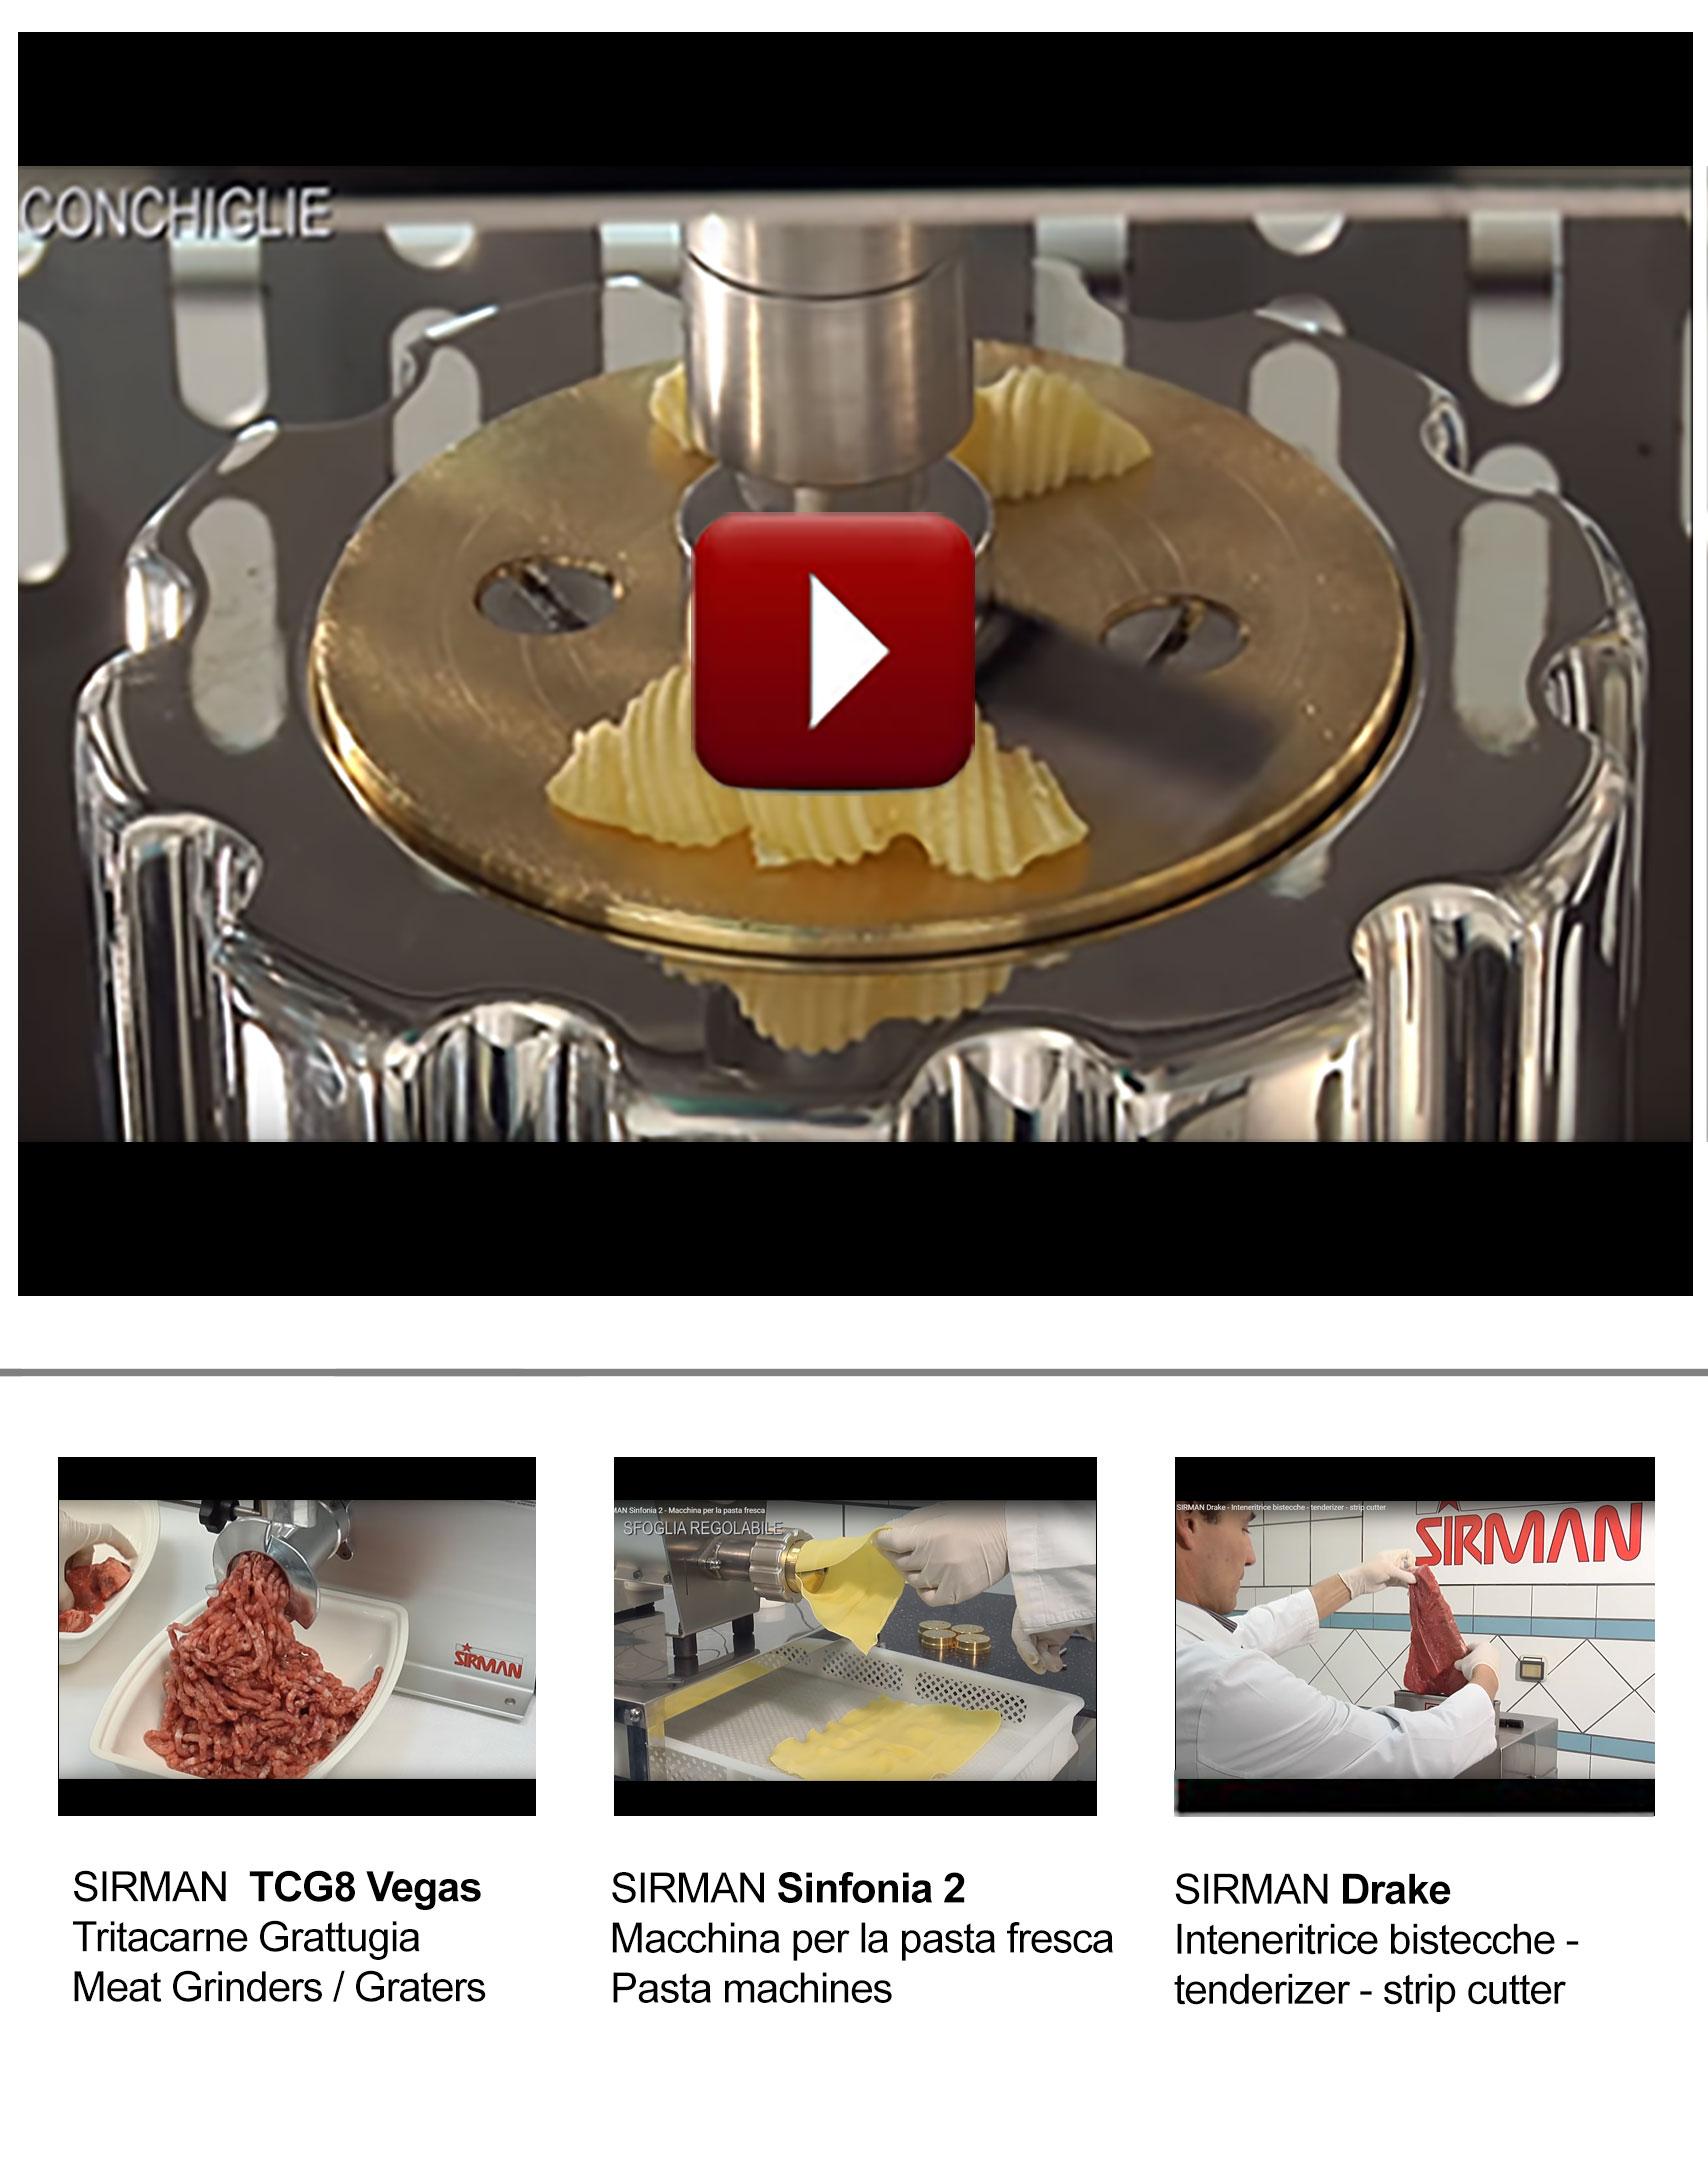 Sirman Channel видеоклип